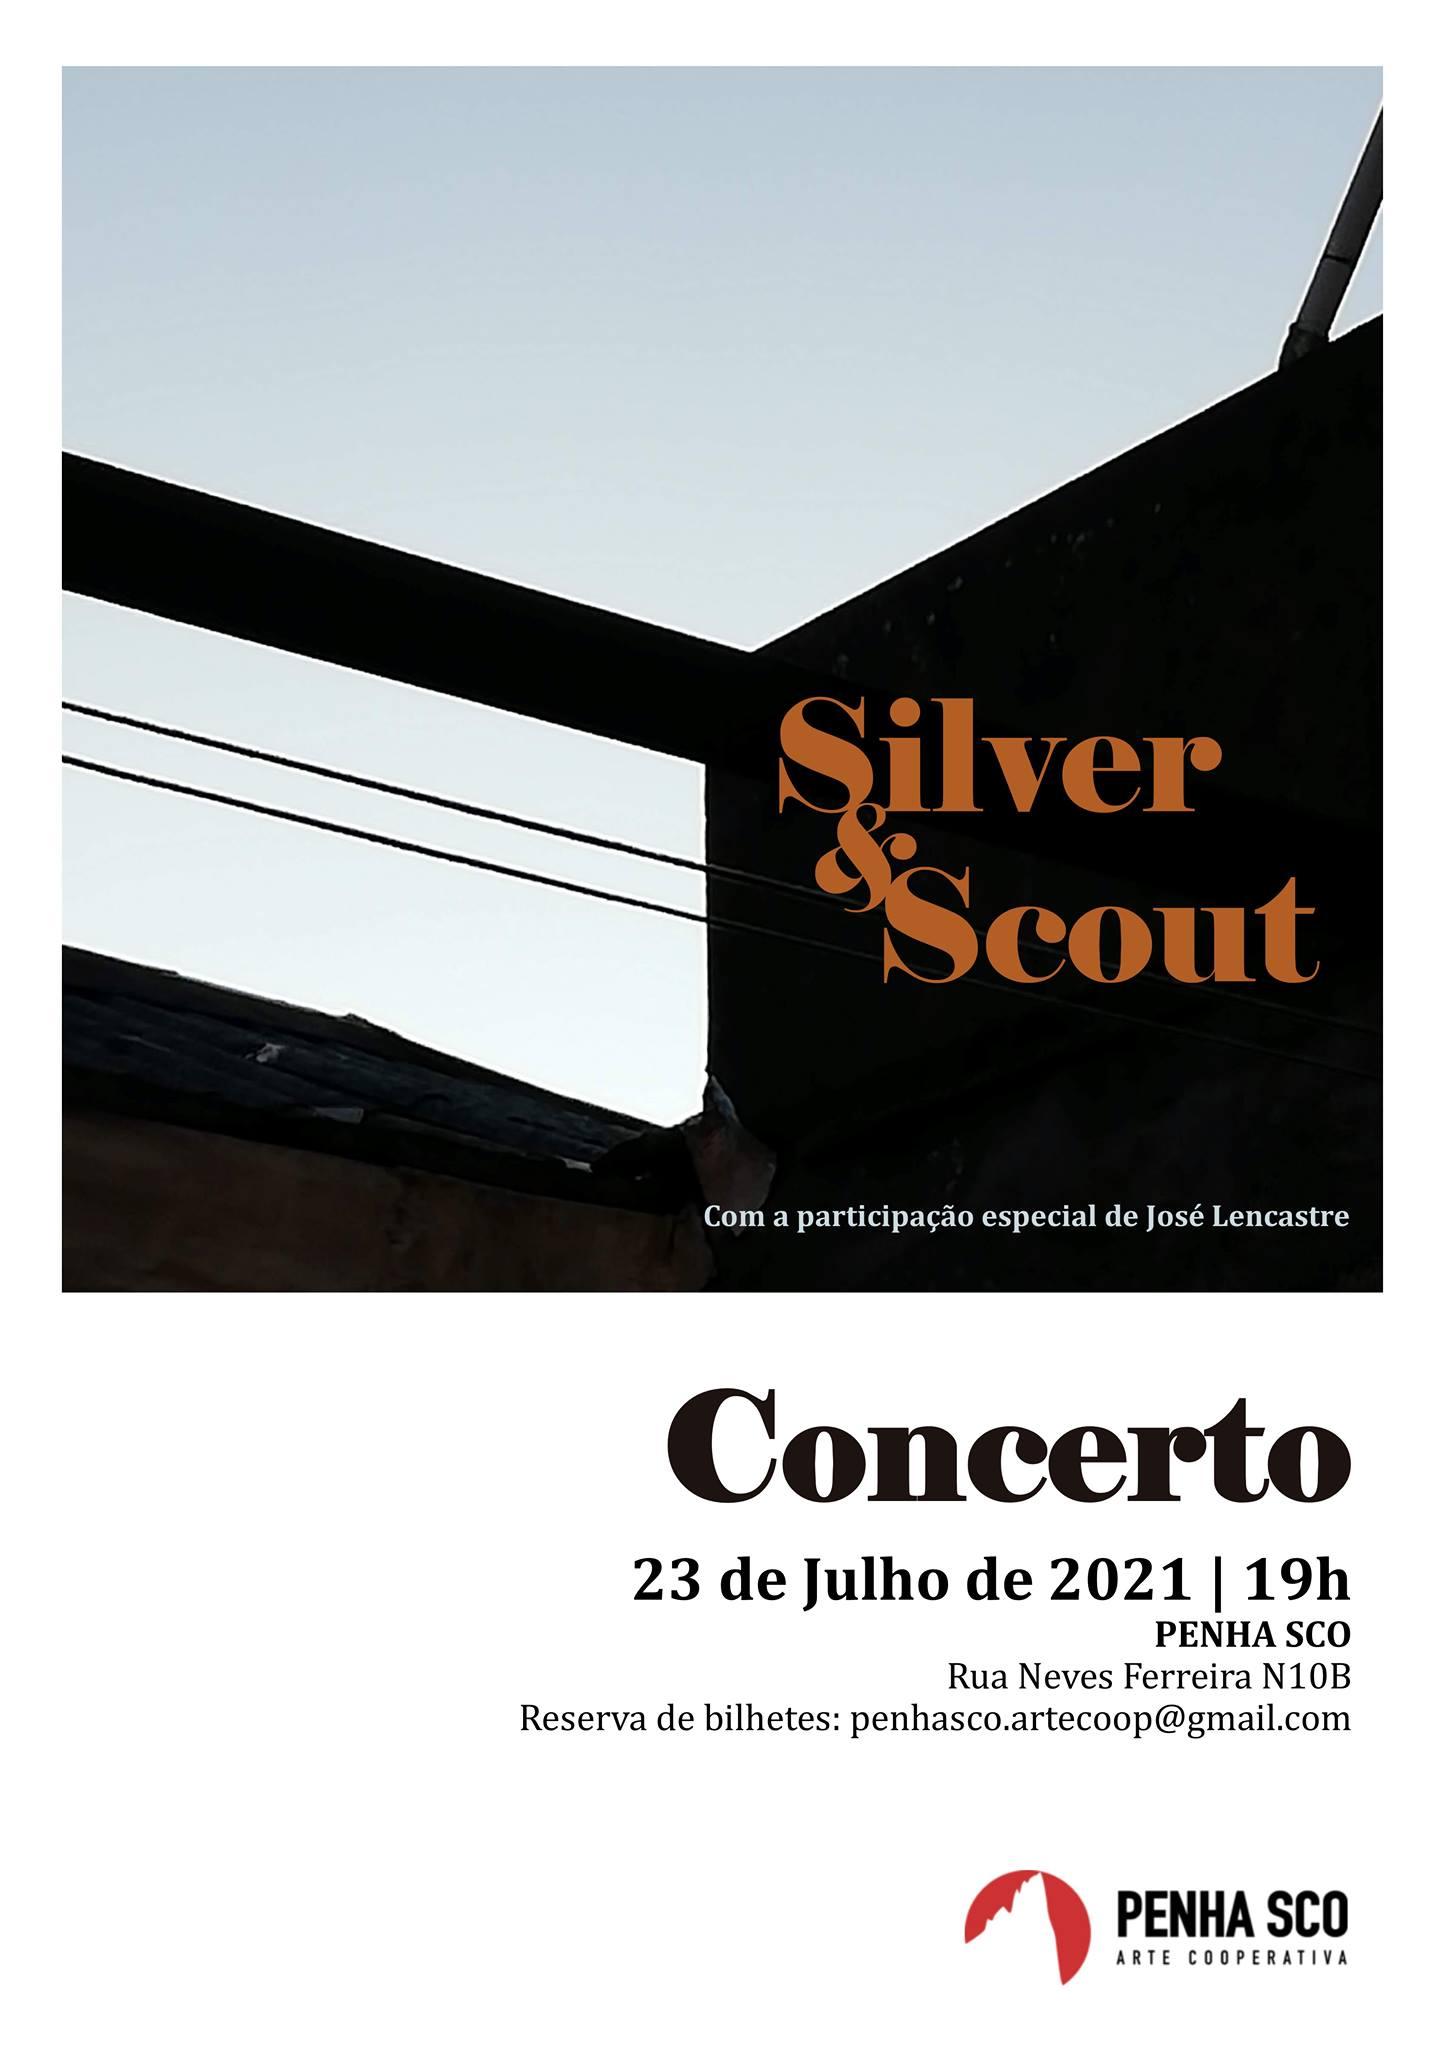 Concerto Silver&Scout